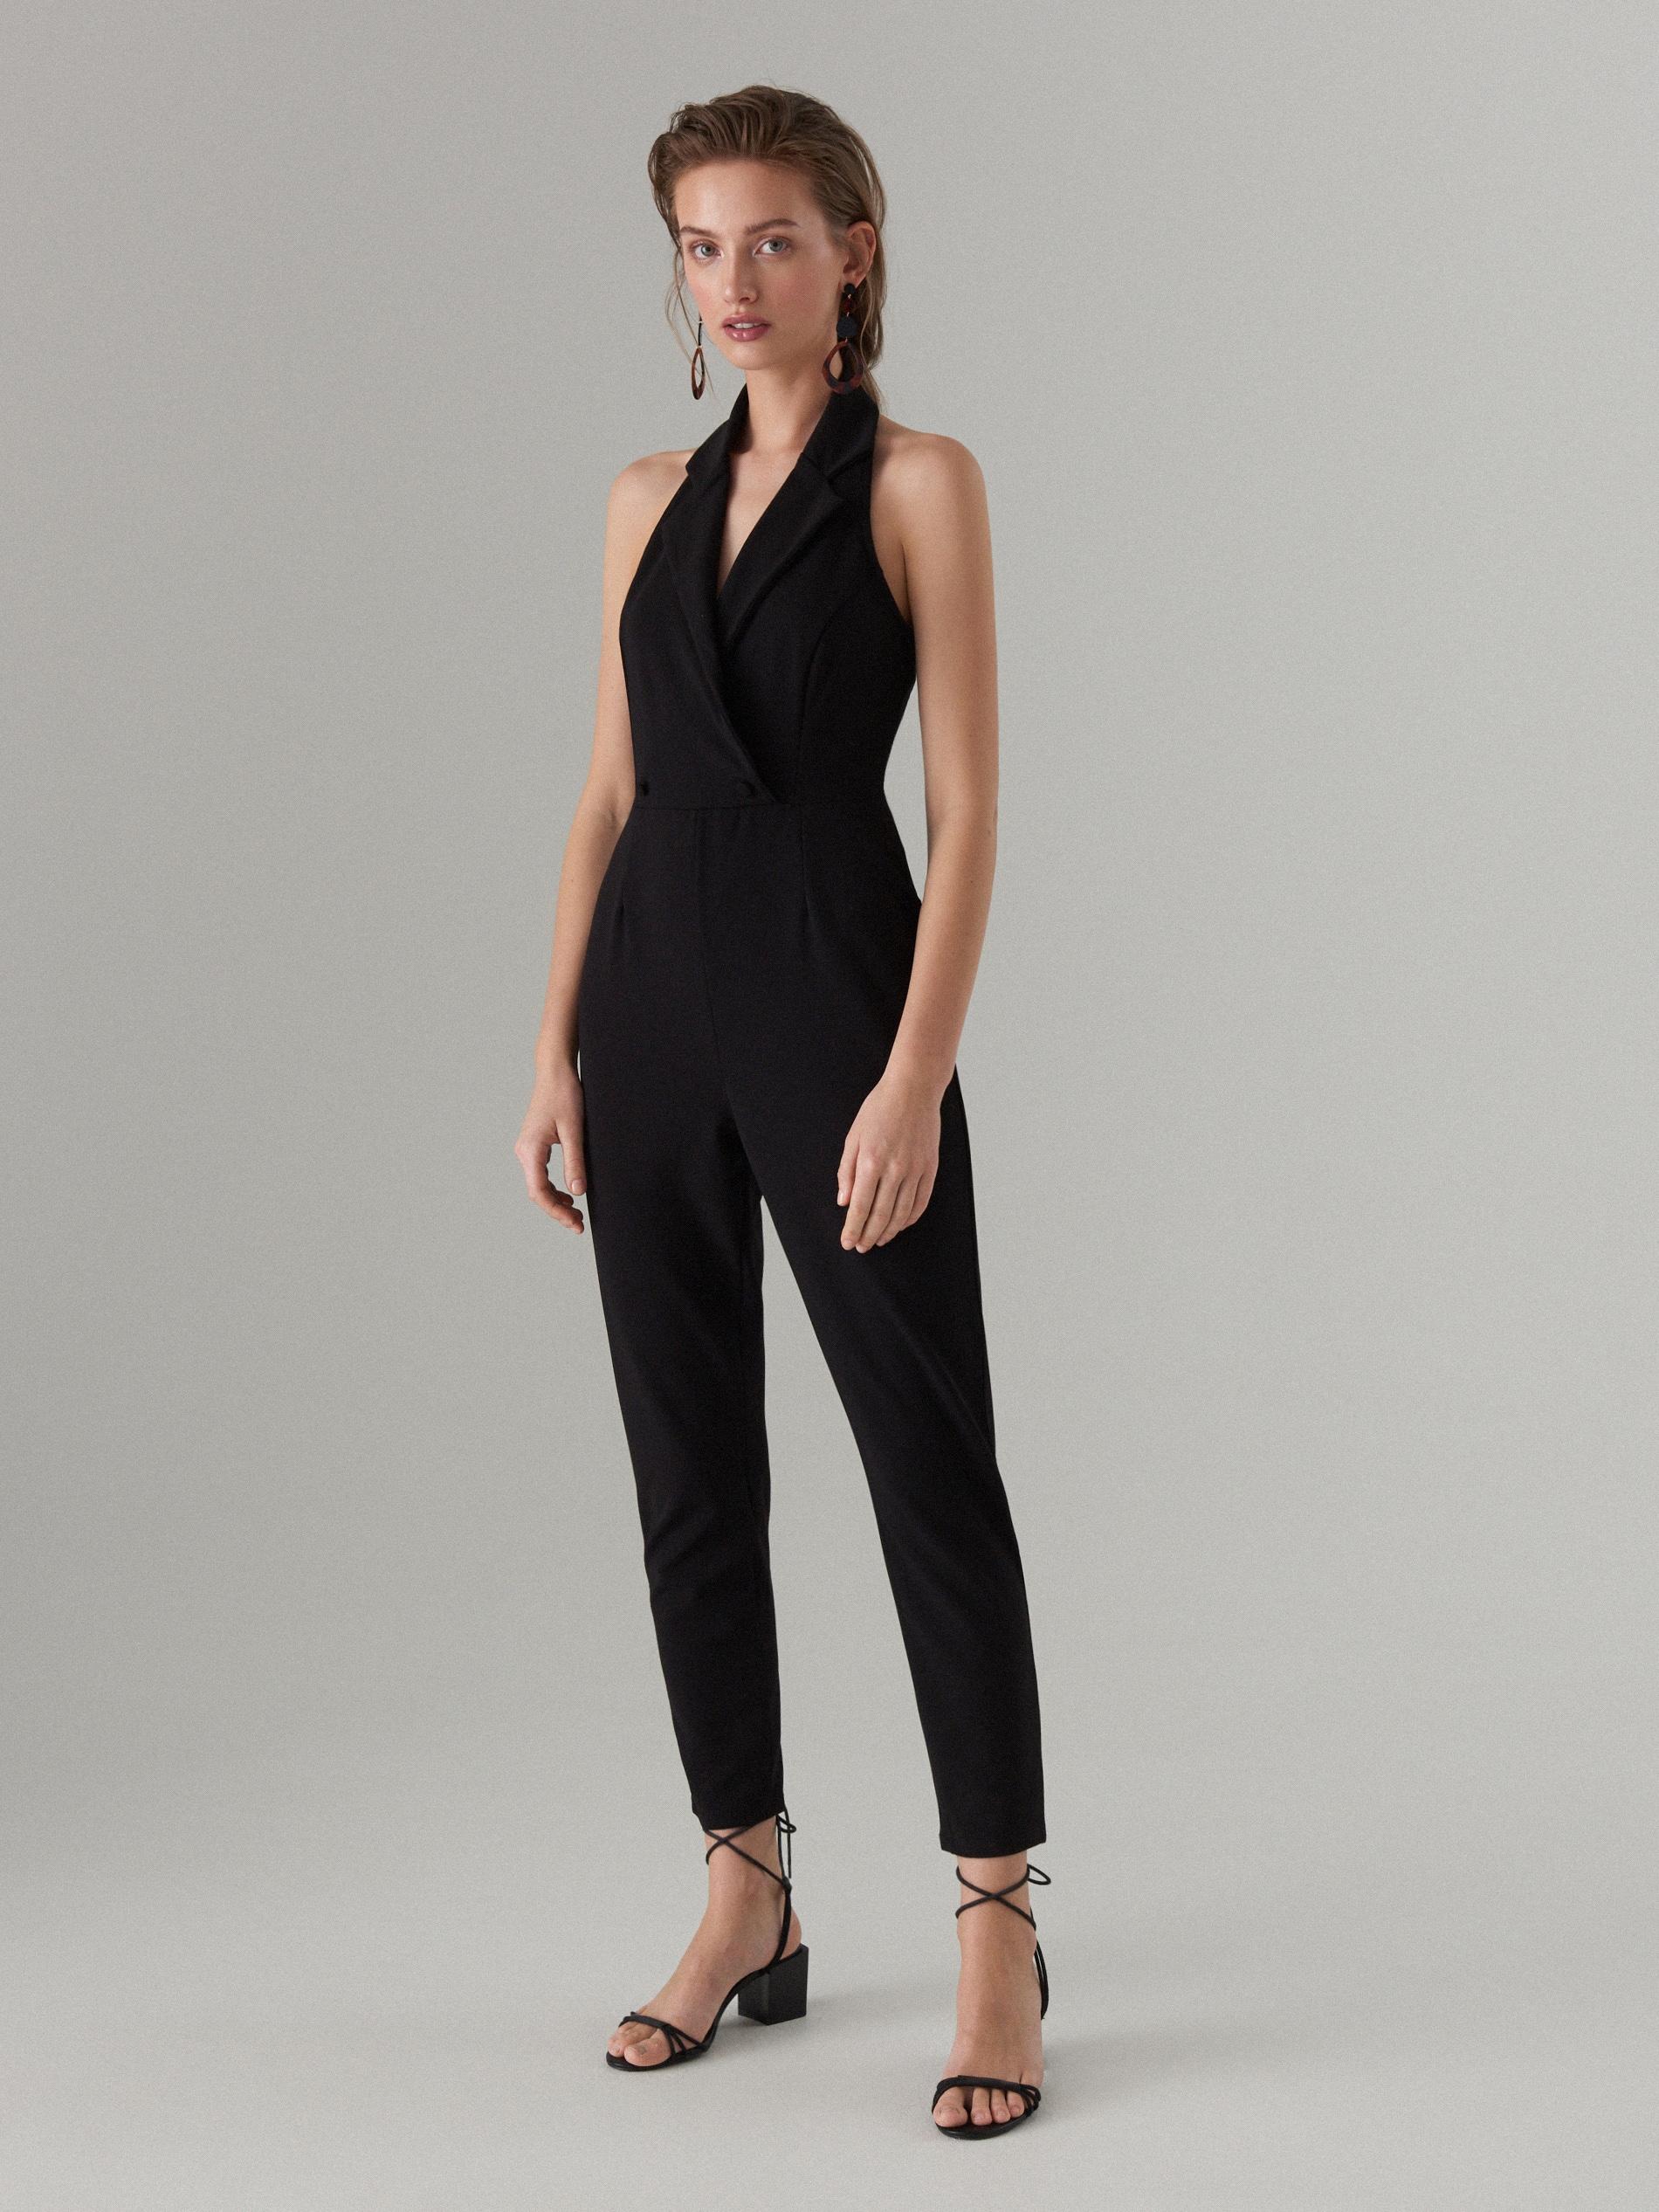 89433b807a Blazer neck jumpsuit - black - WF518-99X - Mohito - 1